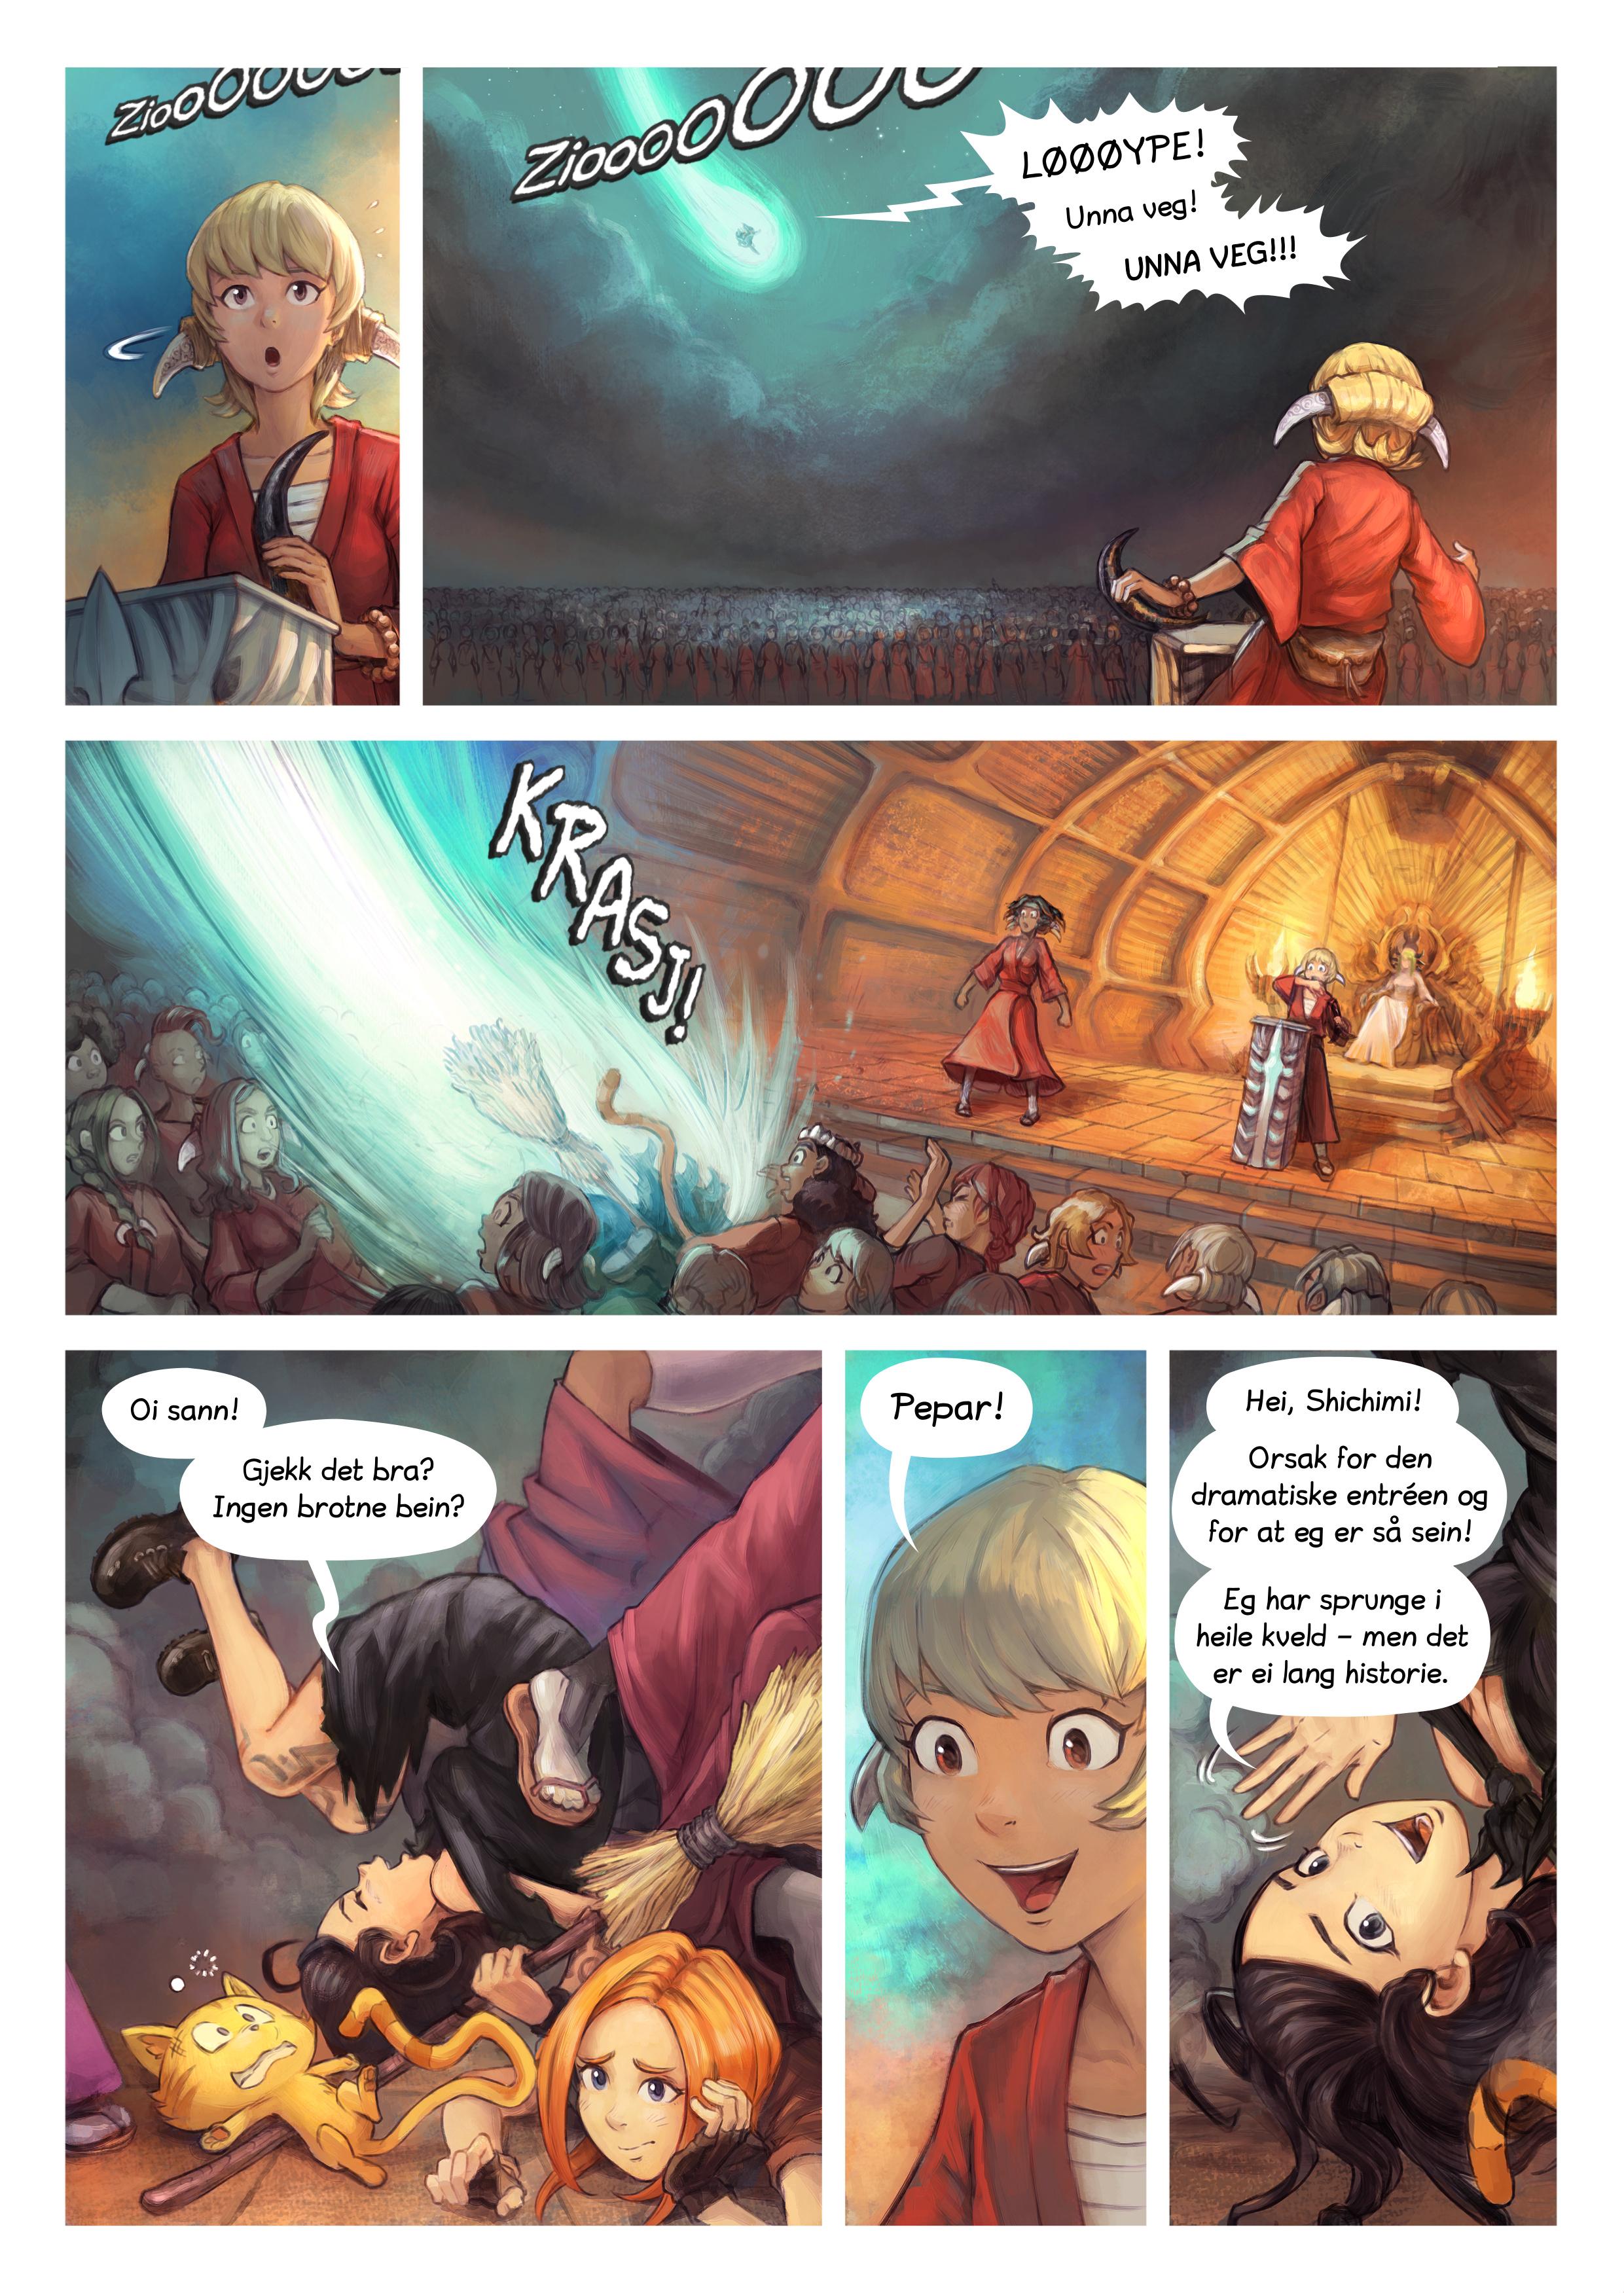 Episode 34: Riddarseremoni for Shichimi, Side 2